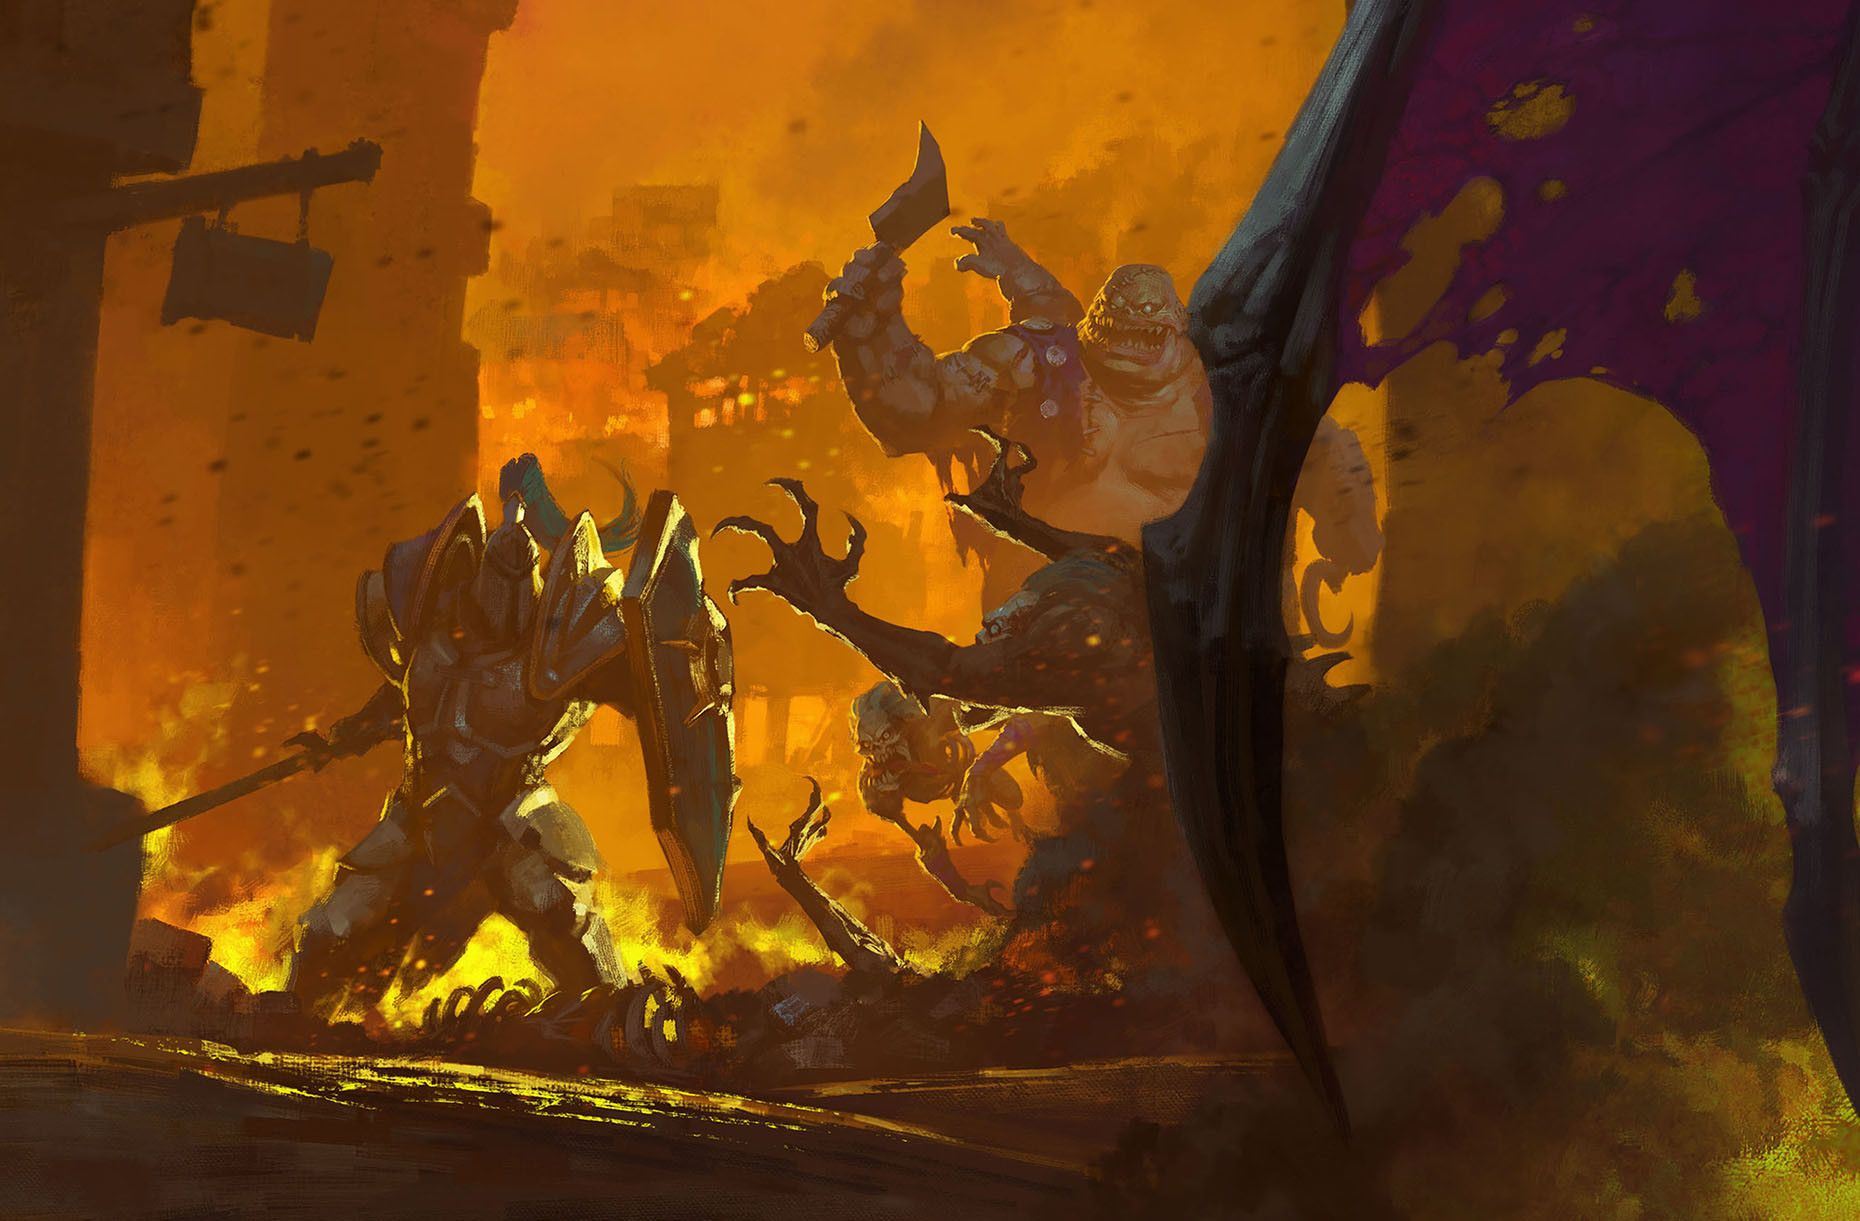 Artstation Gameinformer Cover Warcraft 3 Reforged Bayard Wu